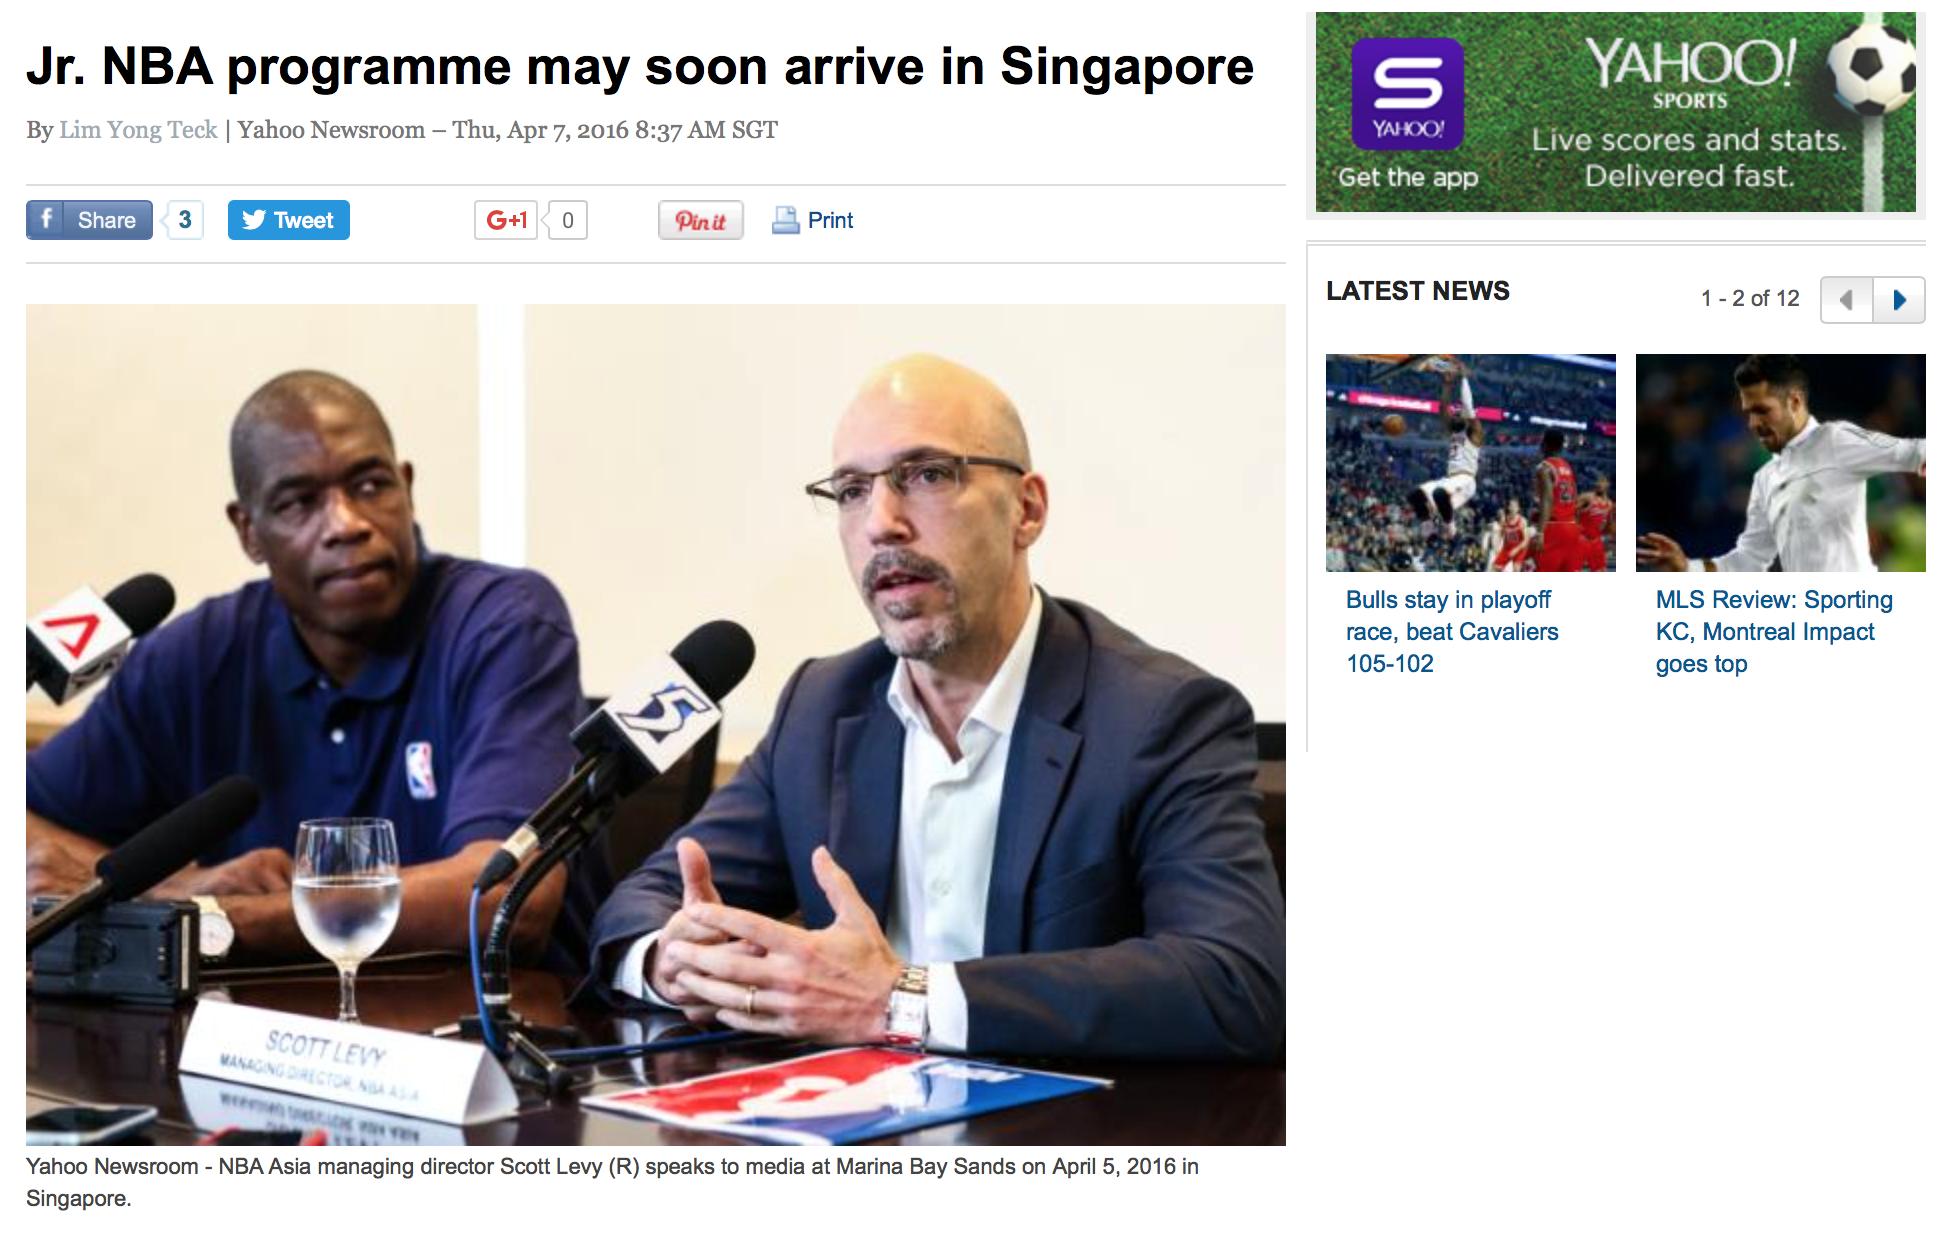 Jr. NBA Asia media roundtable for Yahoo! (www.yahoo.com)